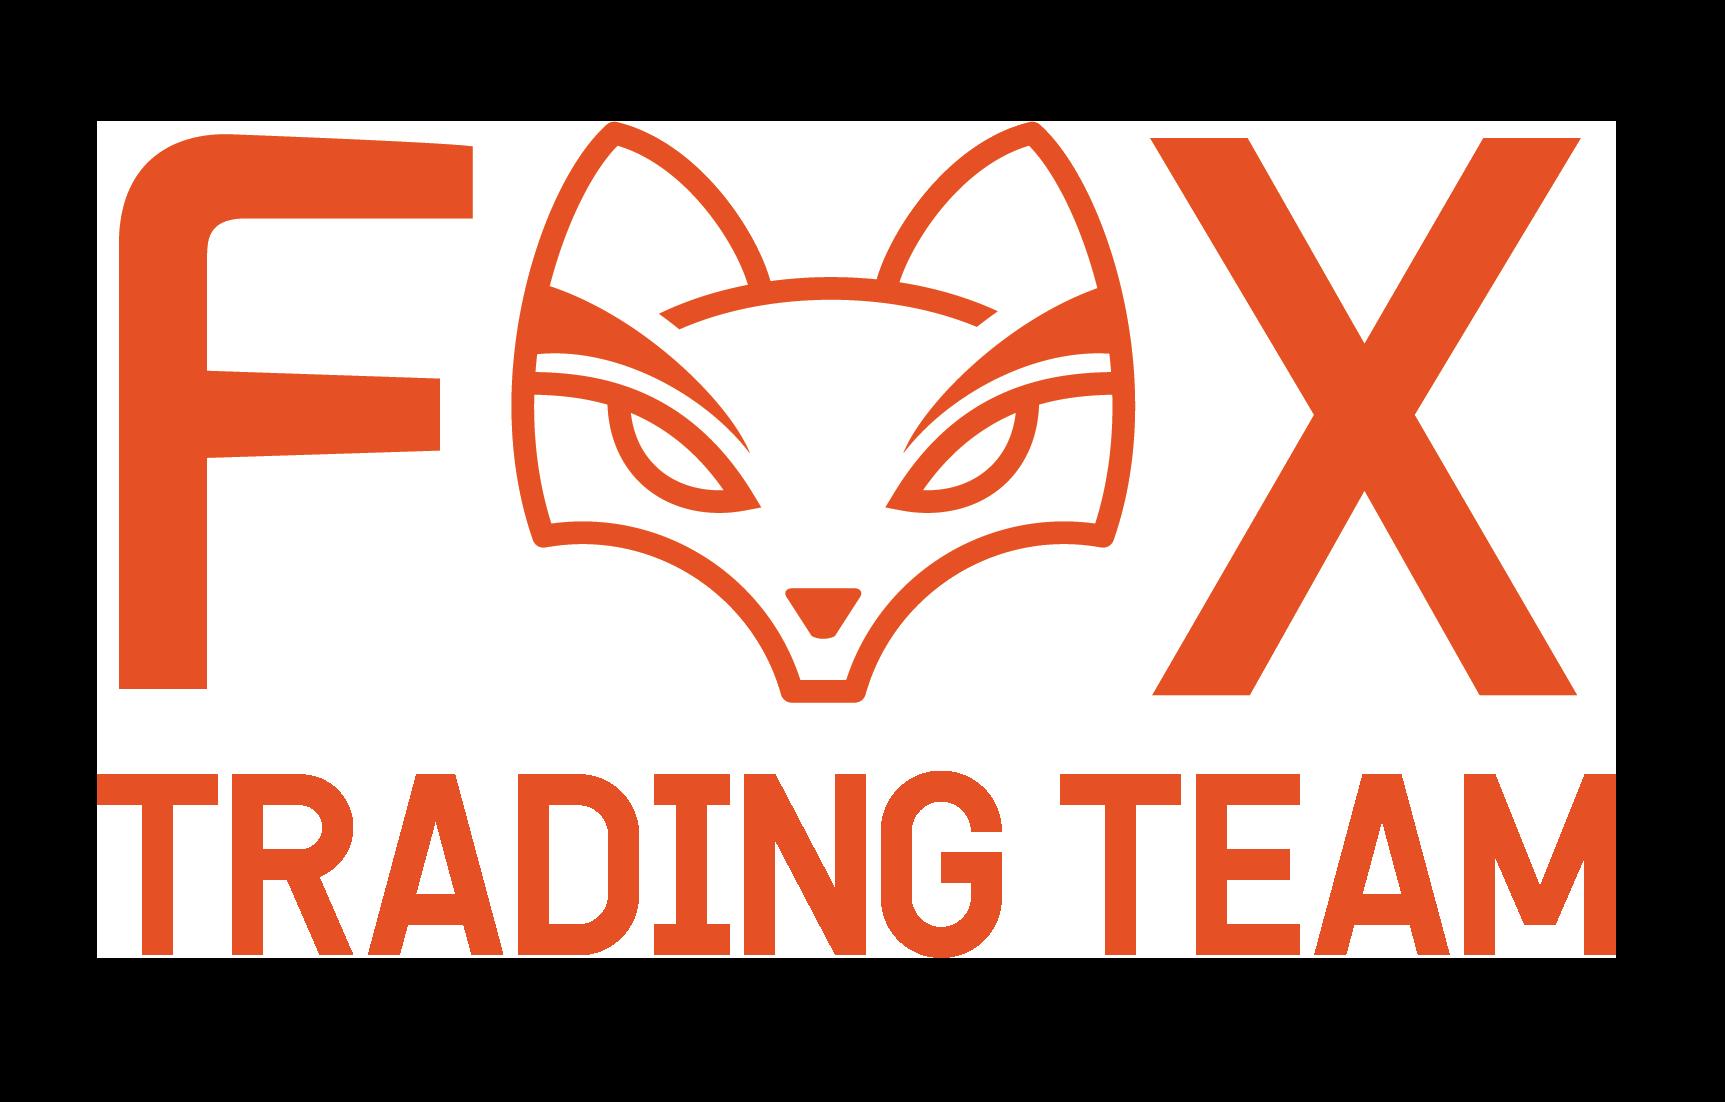 Fox Trading Team